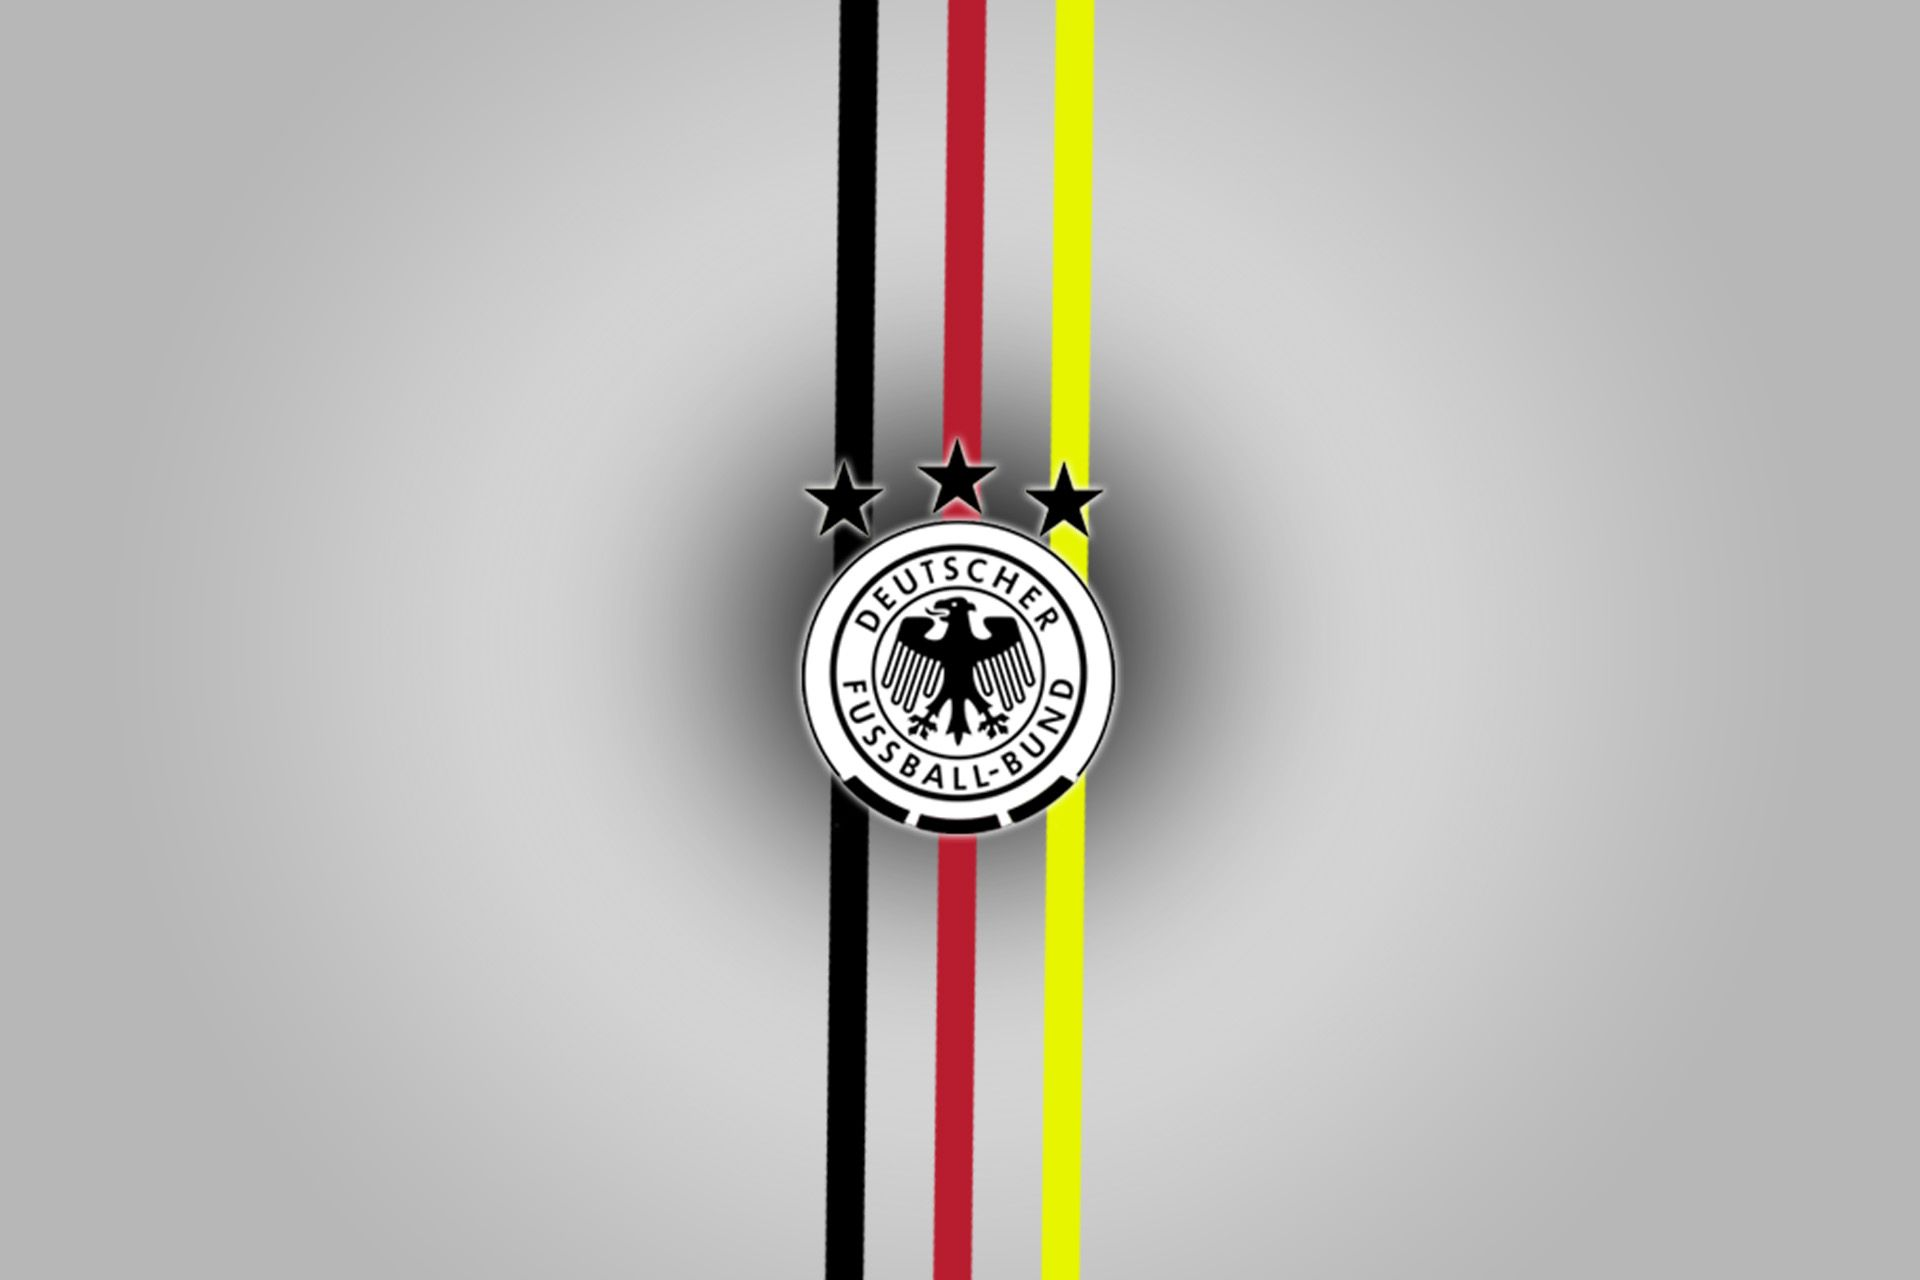 Germany Football Wallpaper  Logos  Football wallpaper, Germany